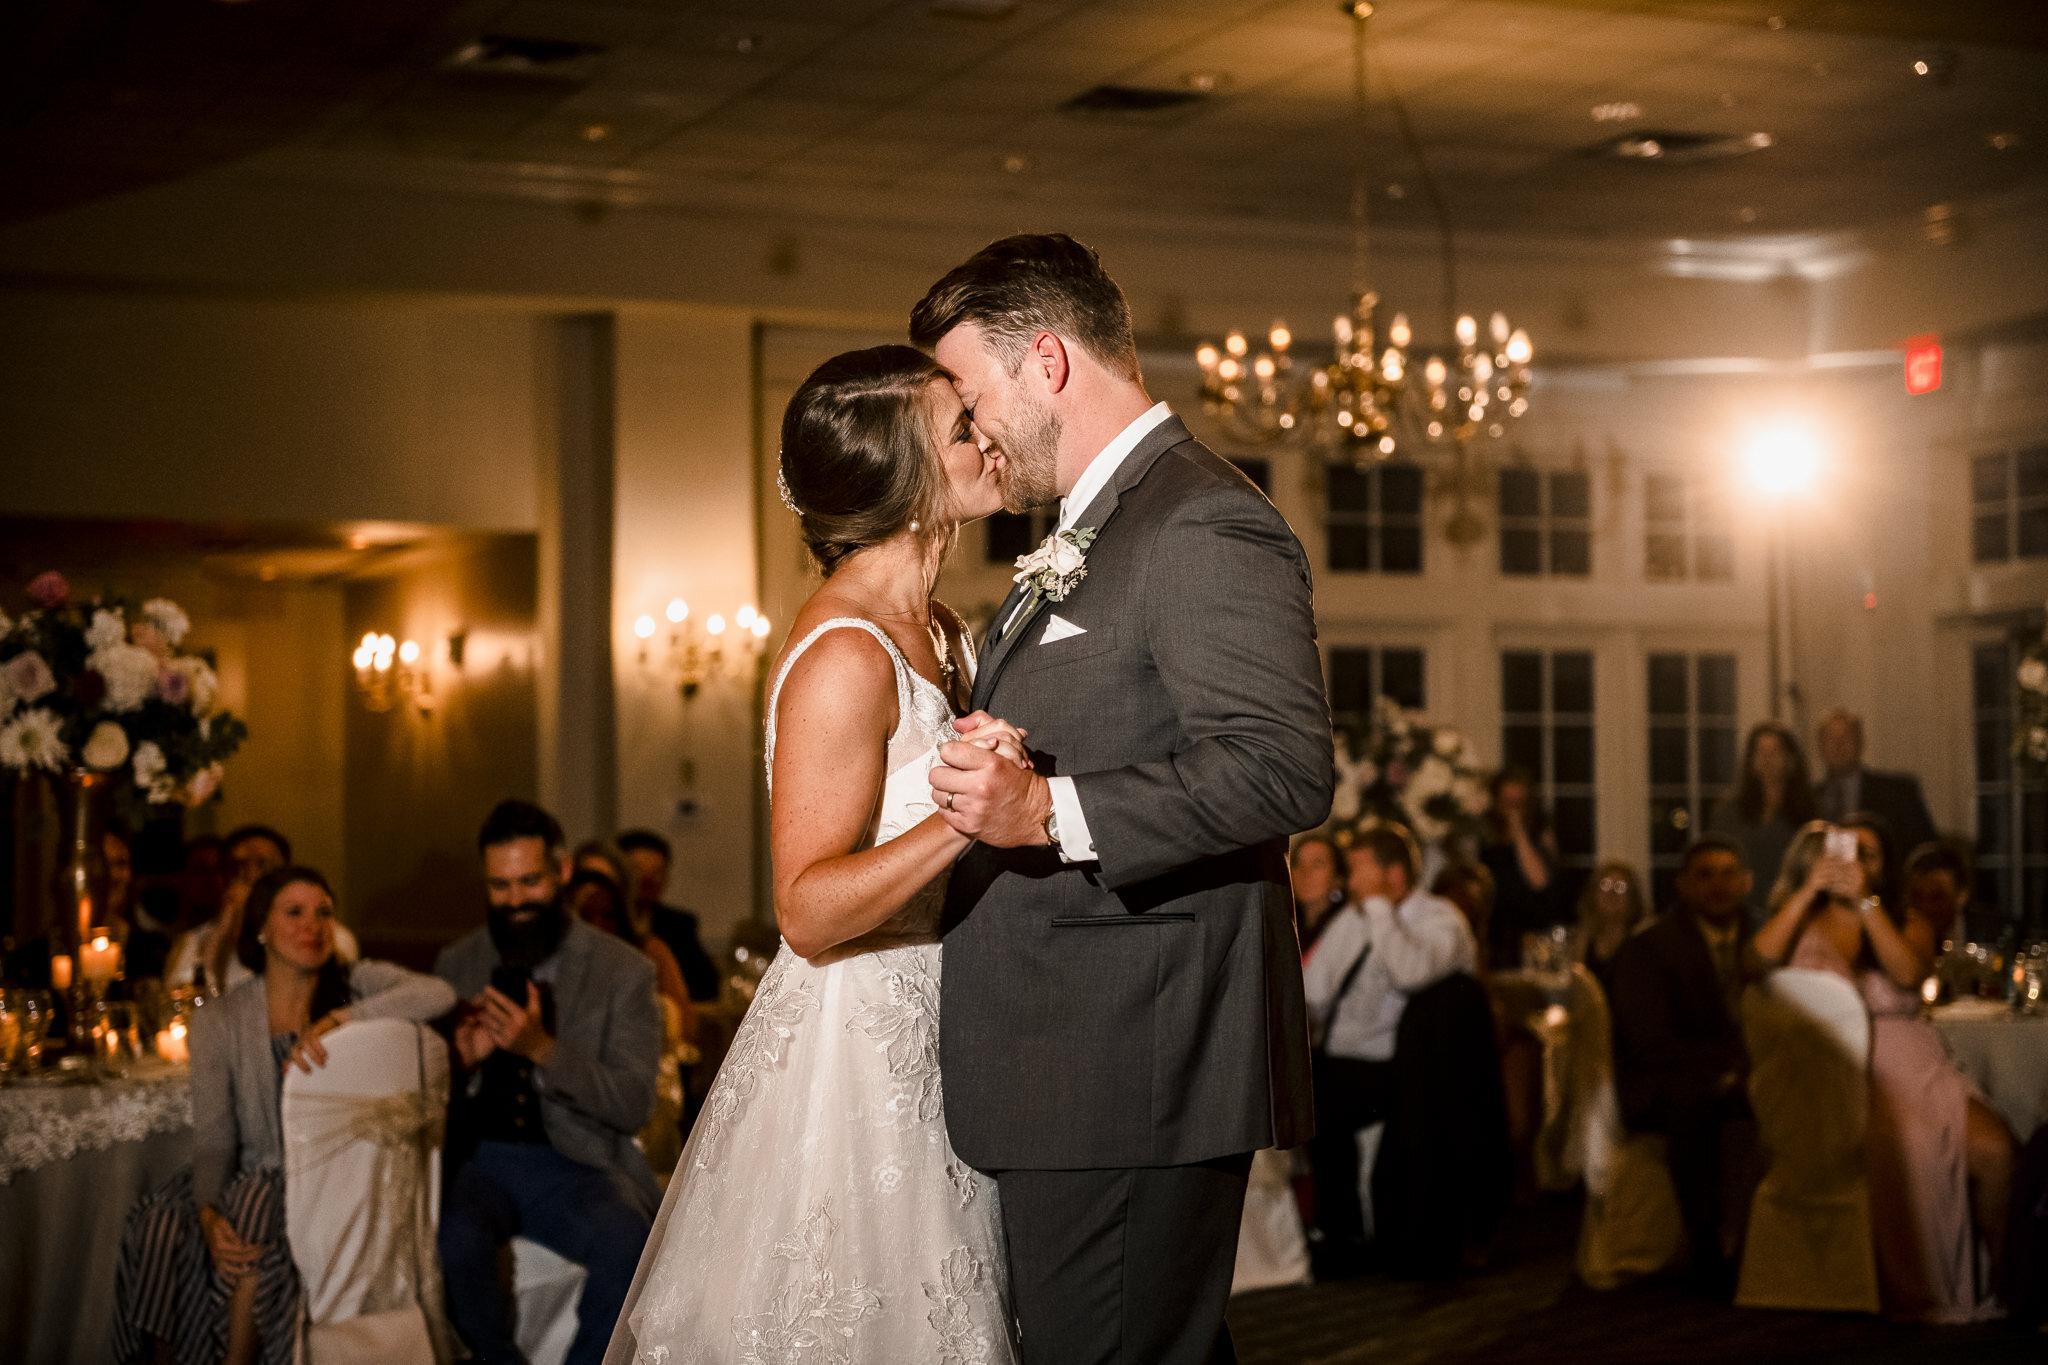 Coyle-Forsgate-Country-Club-Wedding-Photographer-40.JPG